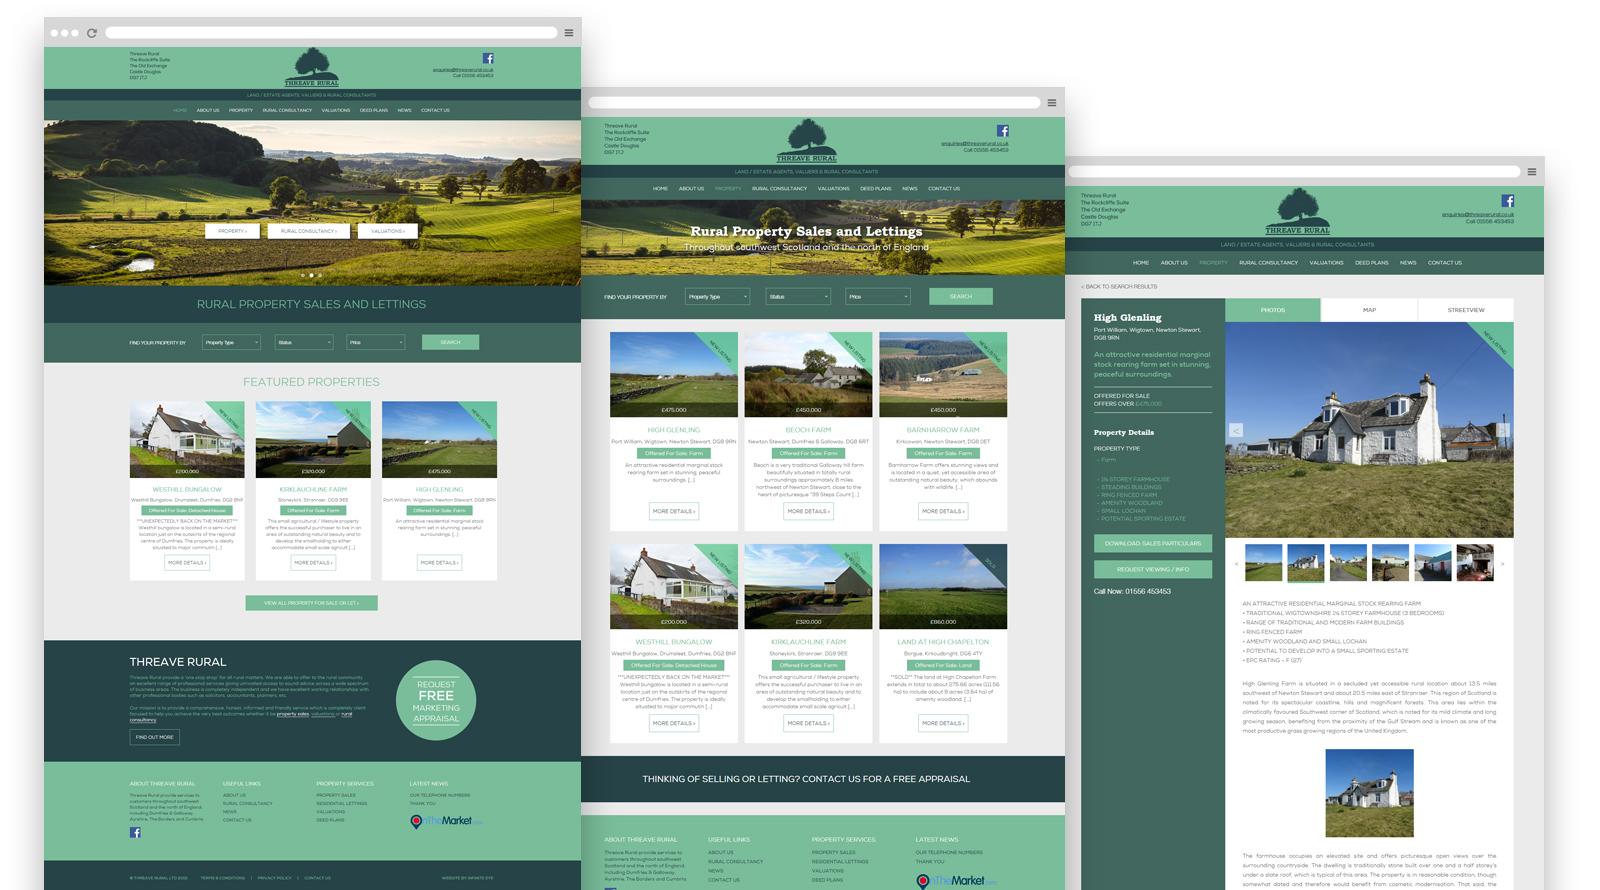 Threave Rural wordpress website